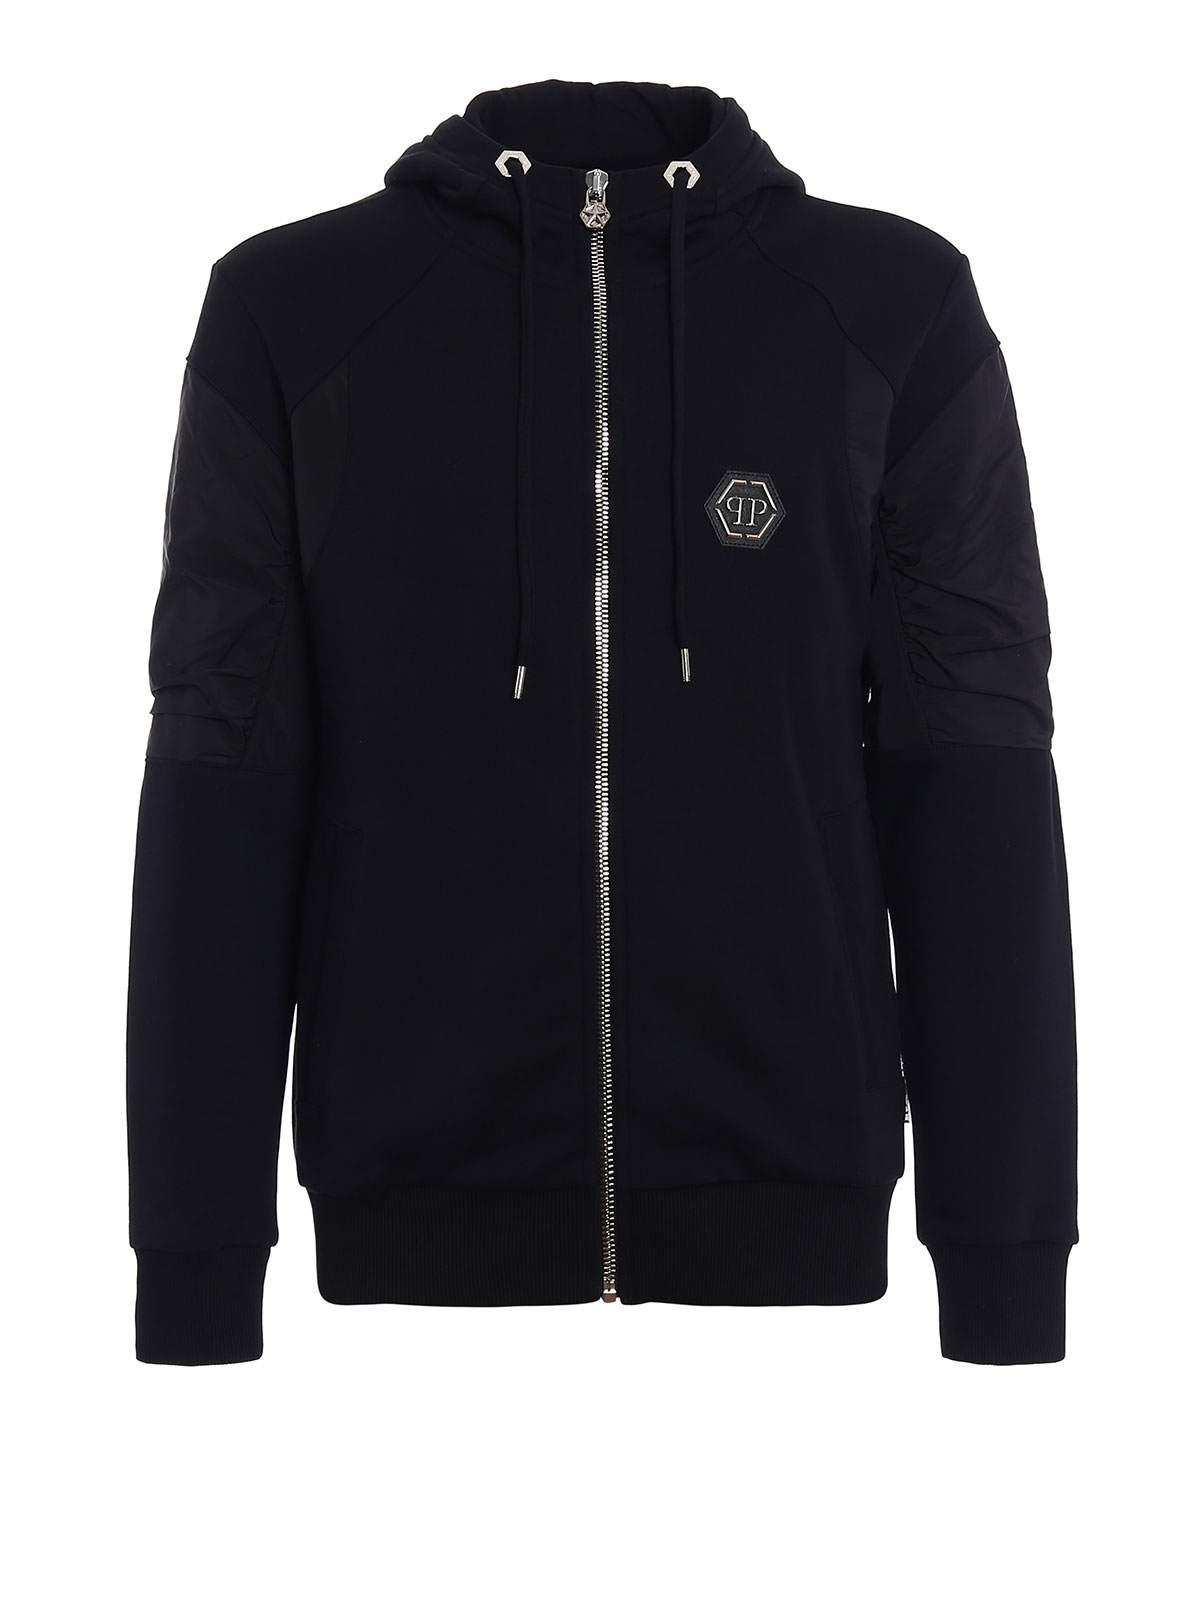 ansya hooded zip sweat jacket by philipp plein sweatshirts sweaters ikrix. Black Bedroom Furniture Sets. Home Design Ideas